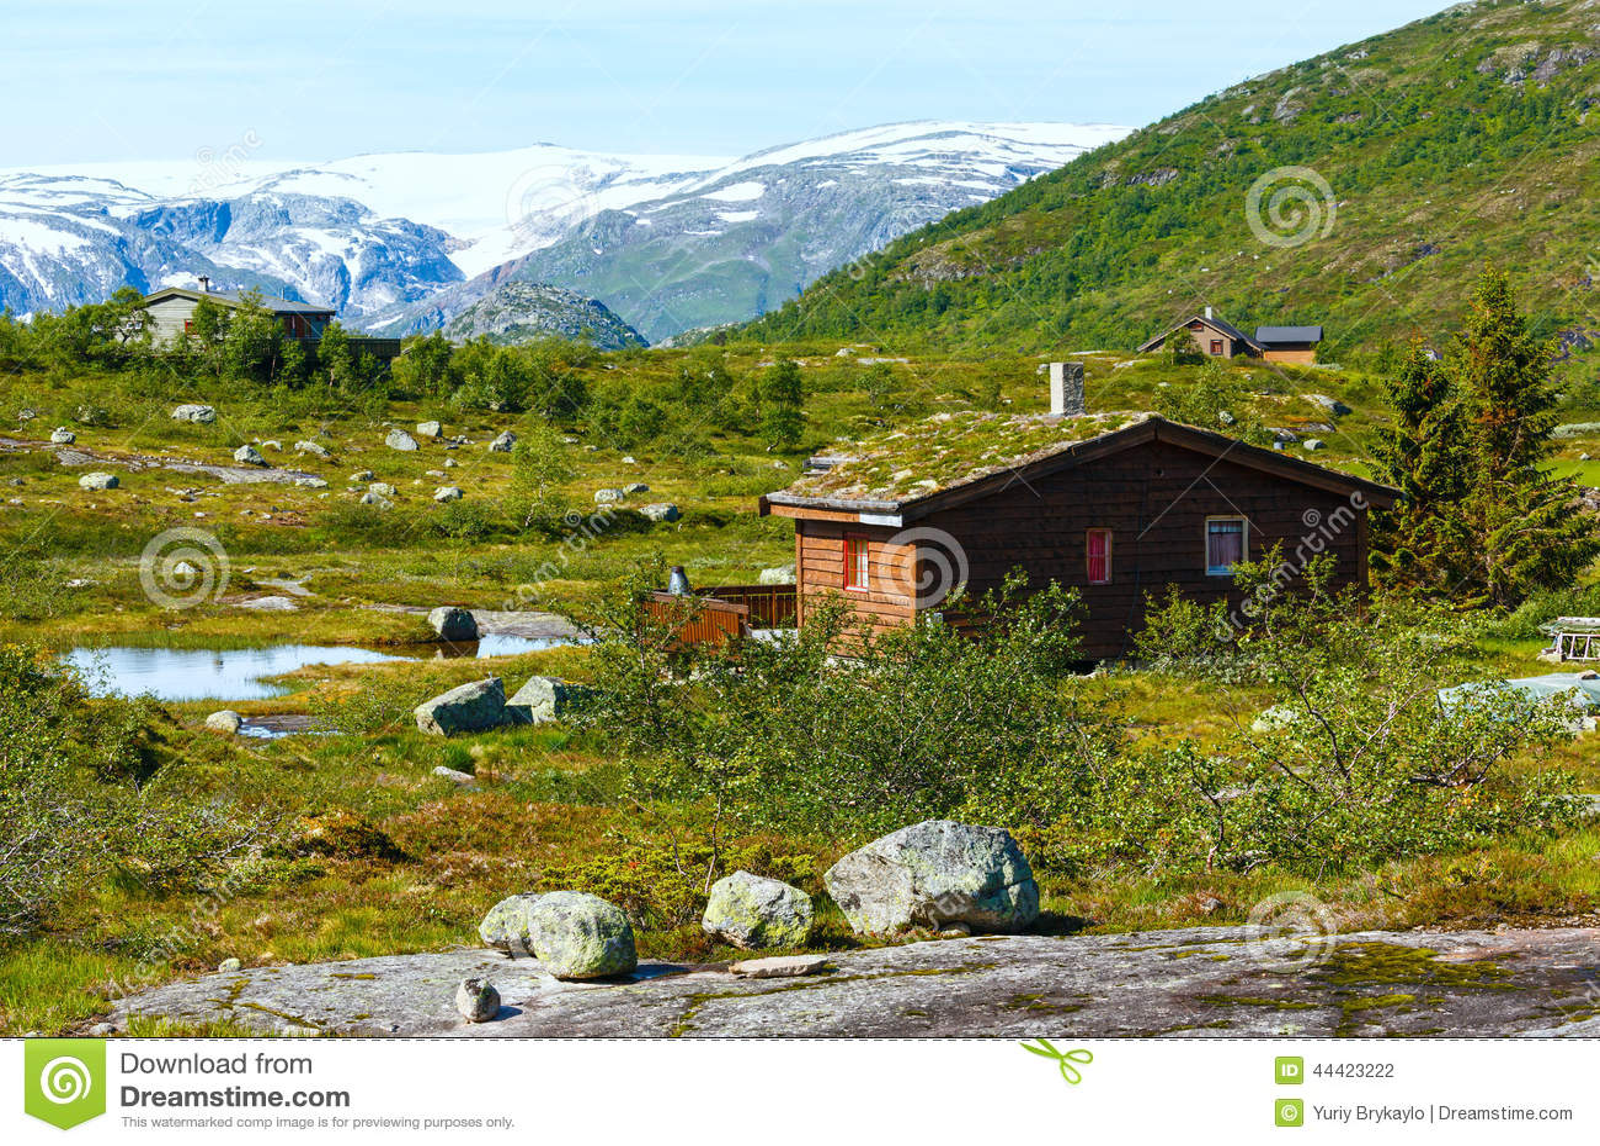 maison en bois en montagne d 39 t norv ge photo stock image 44423222. Black Bedroom Furniture Sets. Home Design Ideas